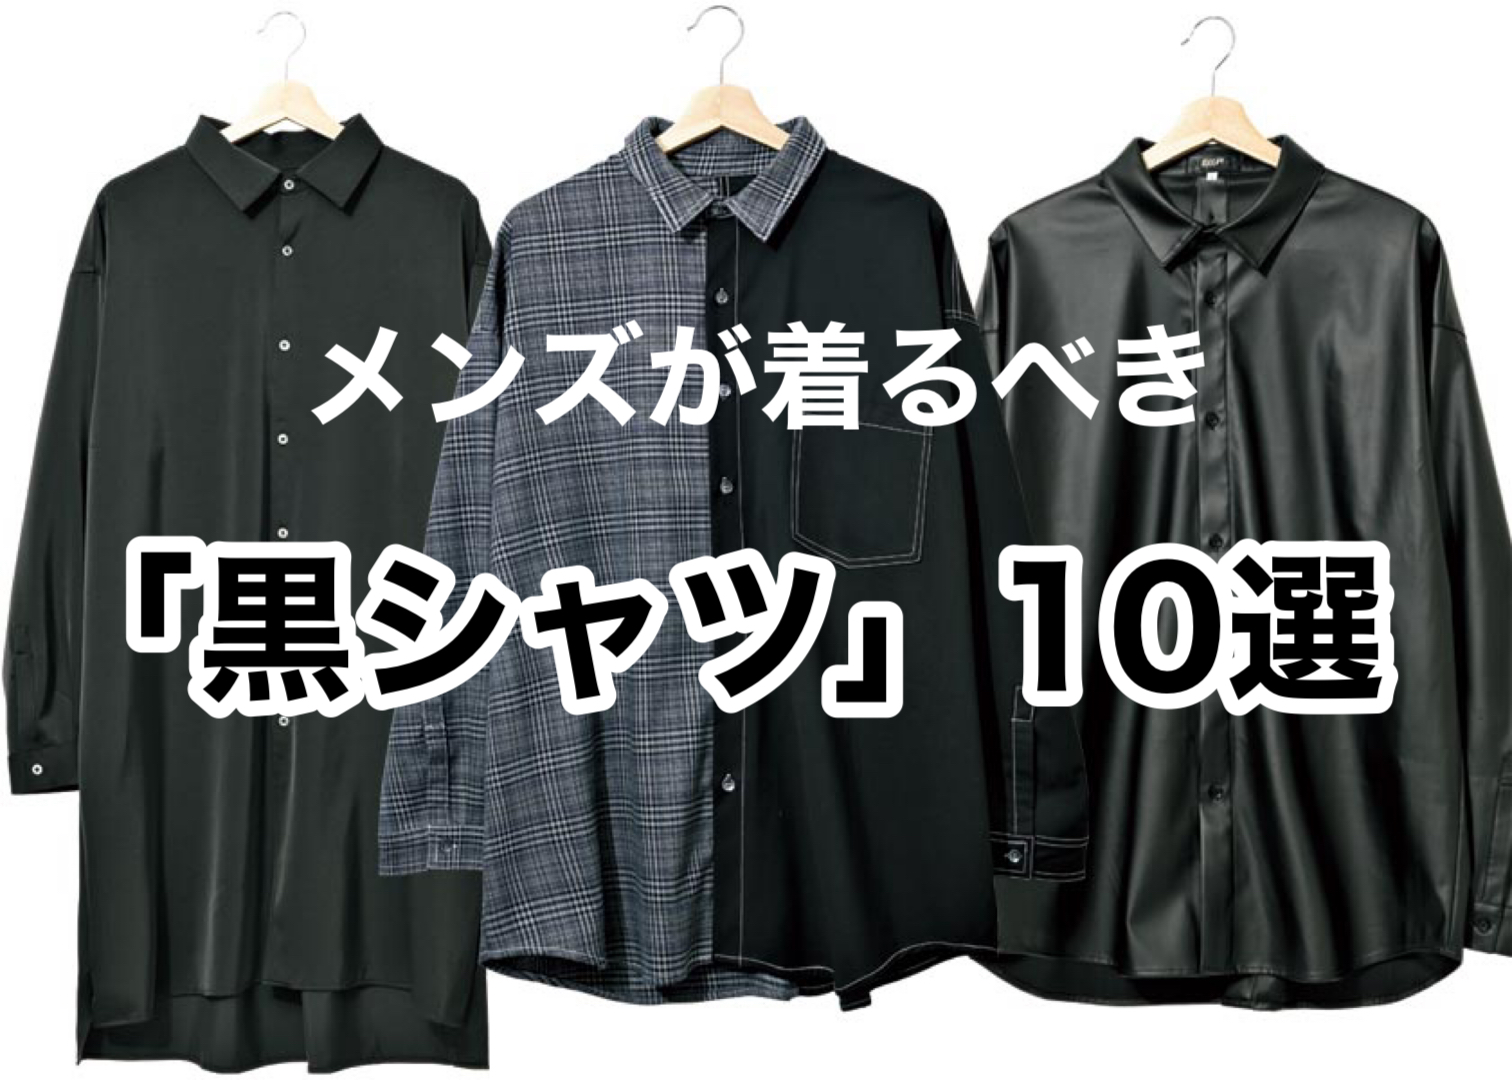 https://cdn.fineboys-online.jp/thegear/content/theme/img/org/article/3395/main.jpg?t=1622431620